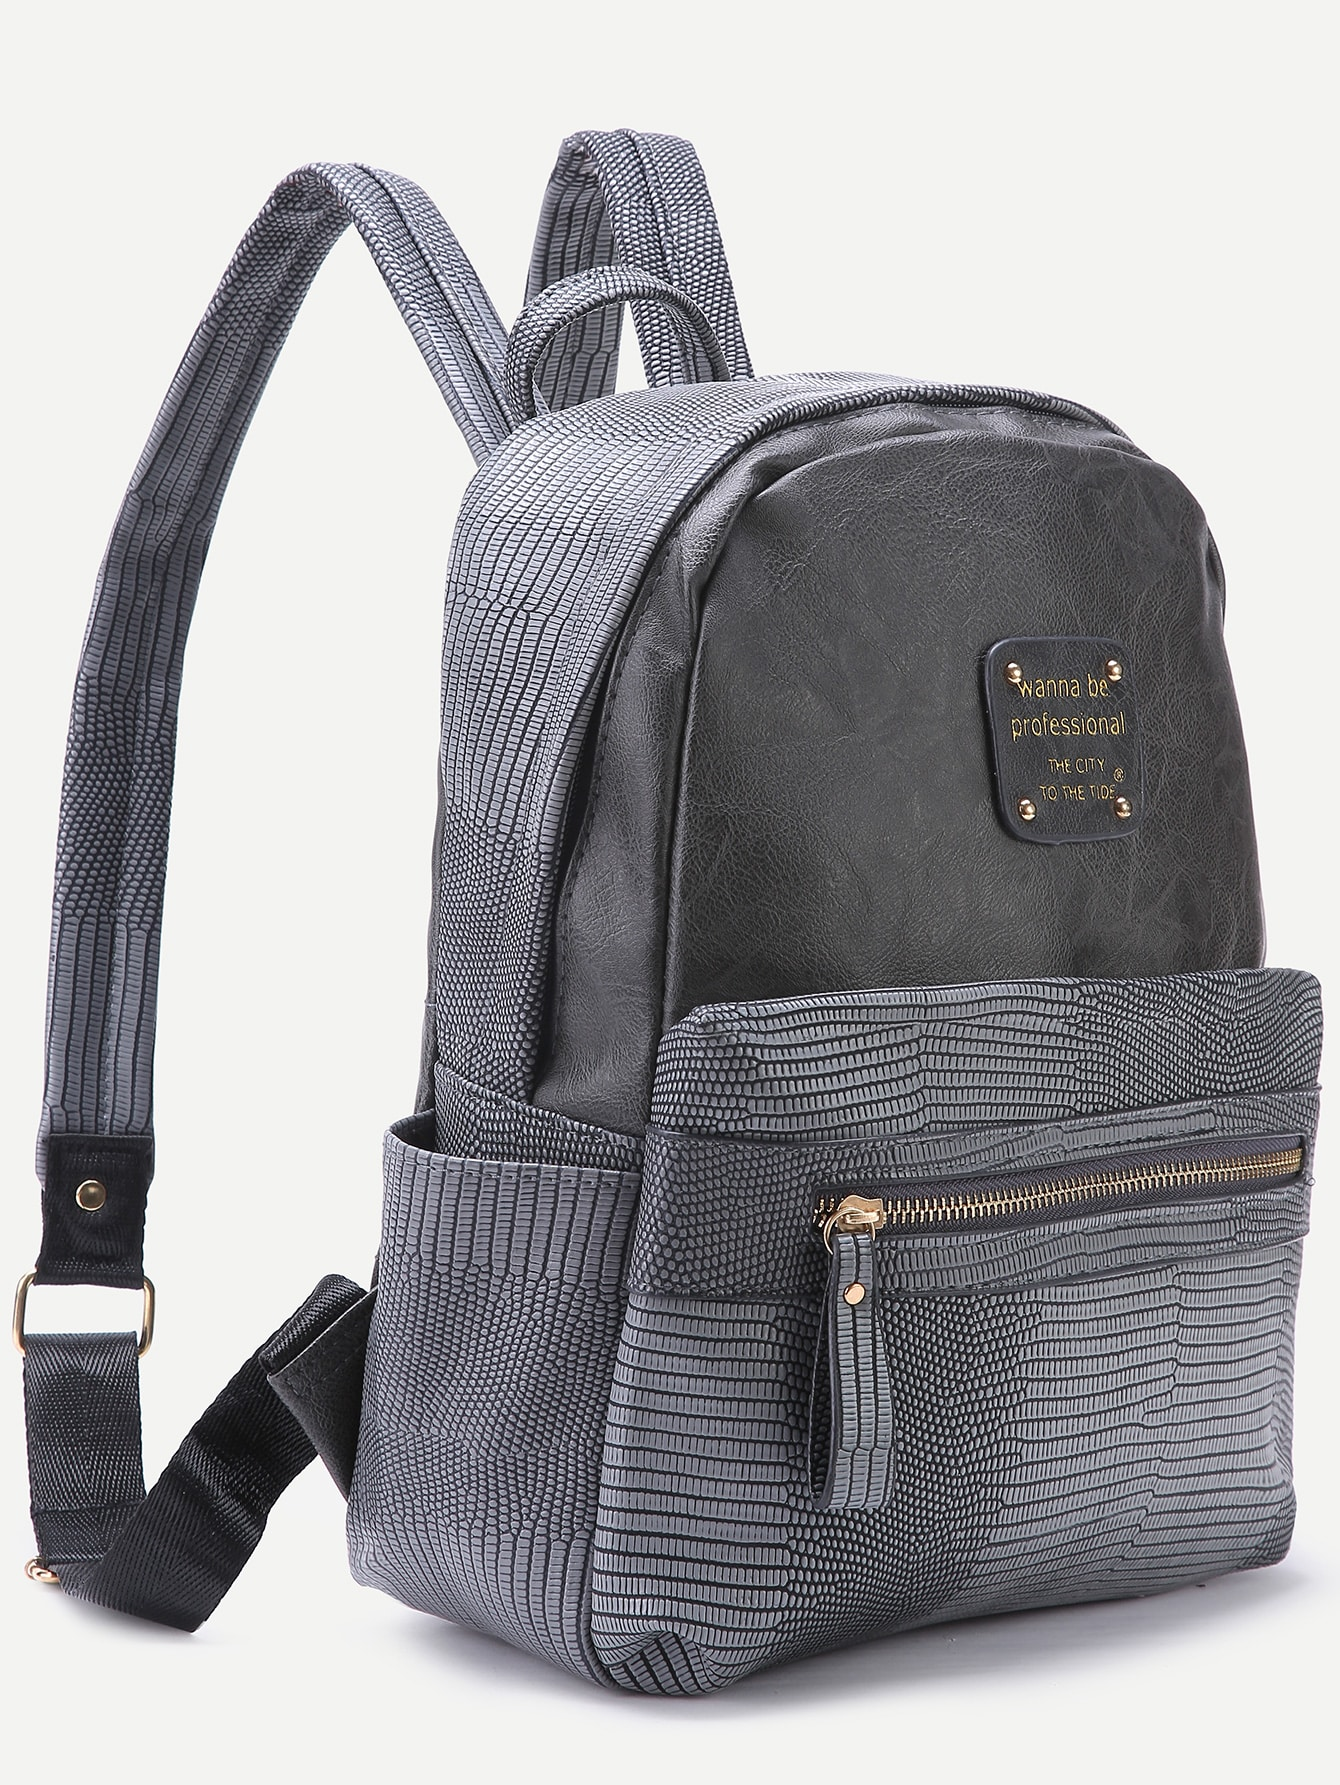 bag160908313_2